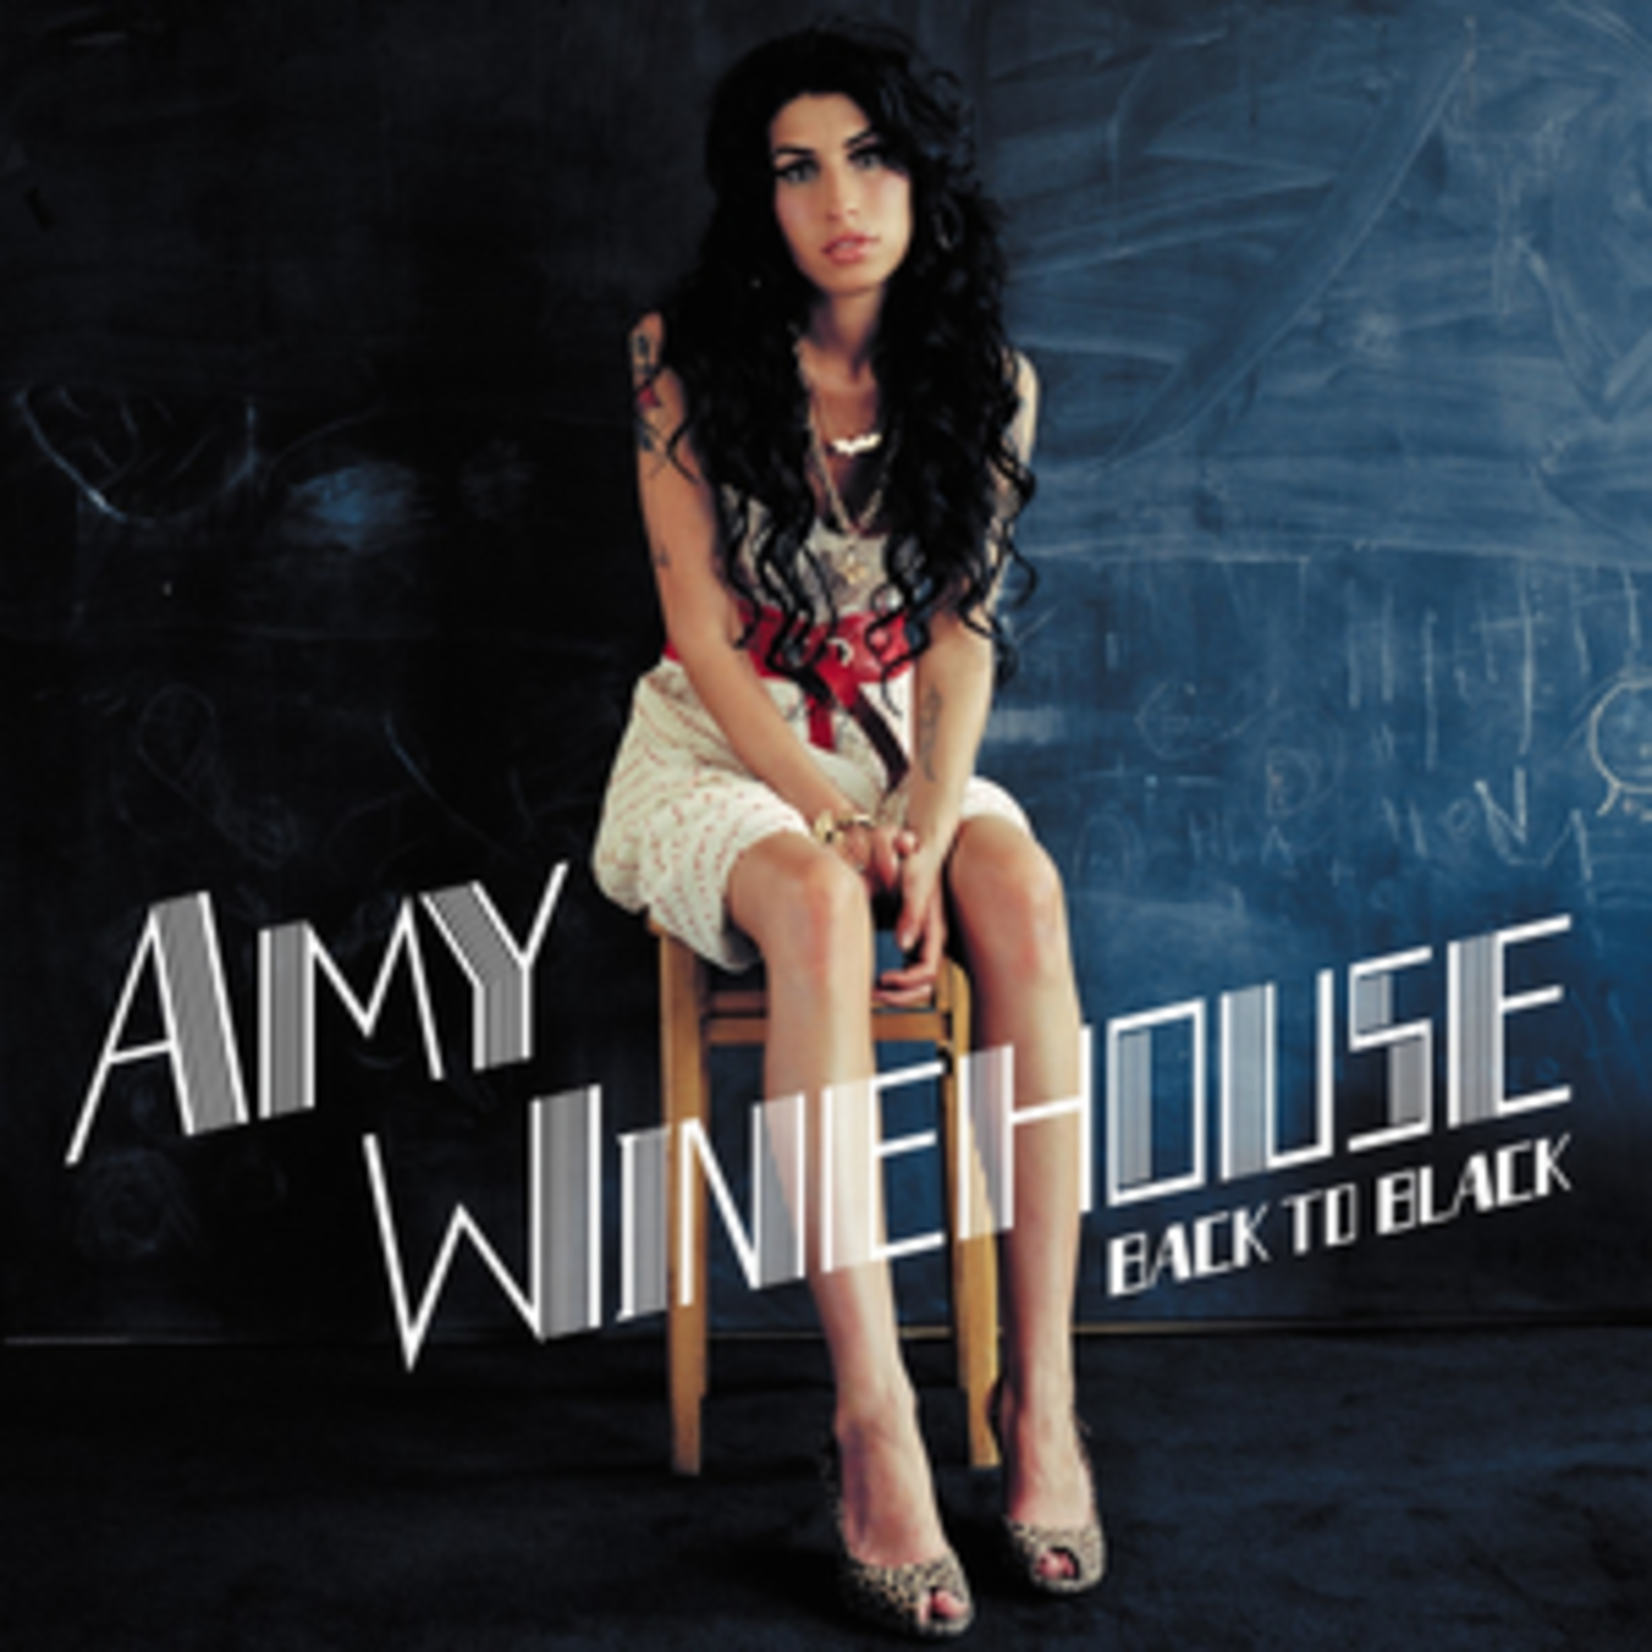 Winehouse_ Amy - Back to Black  (VINYL)